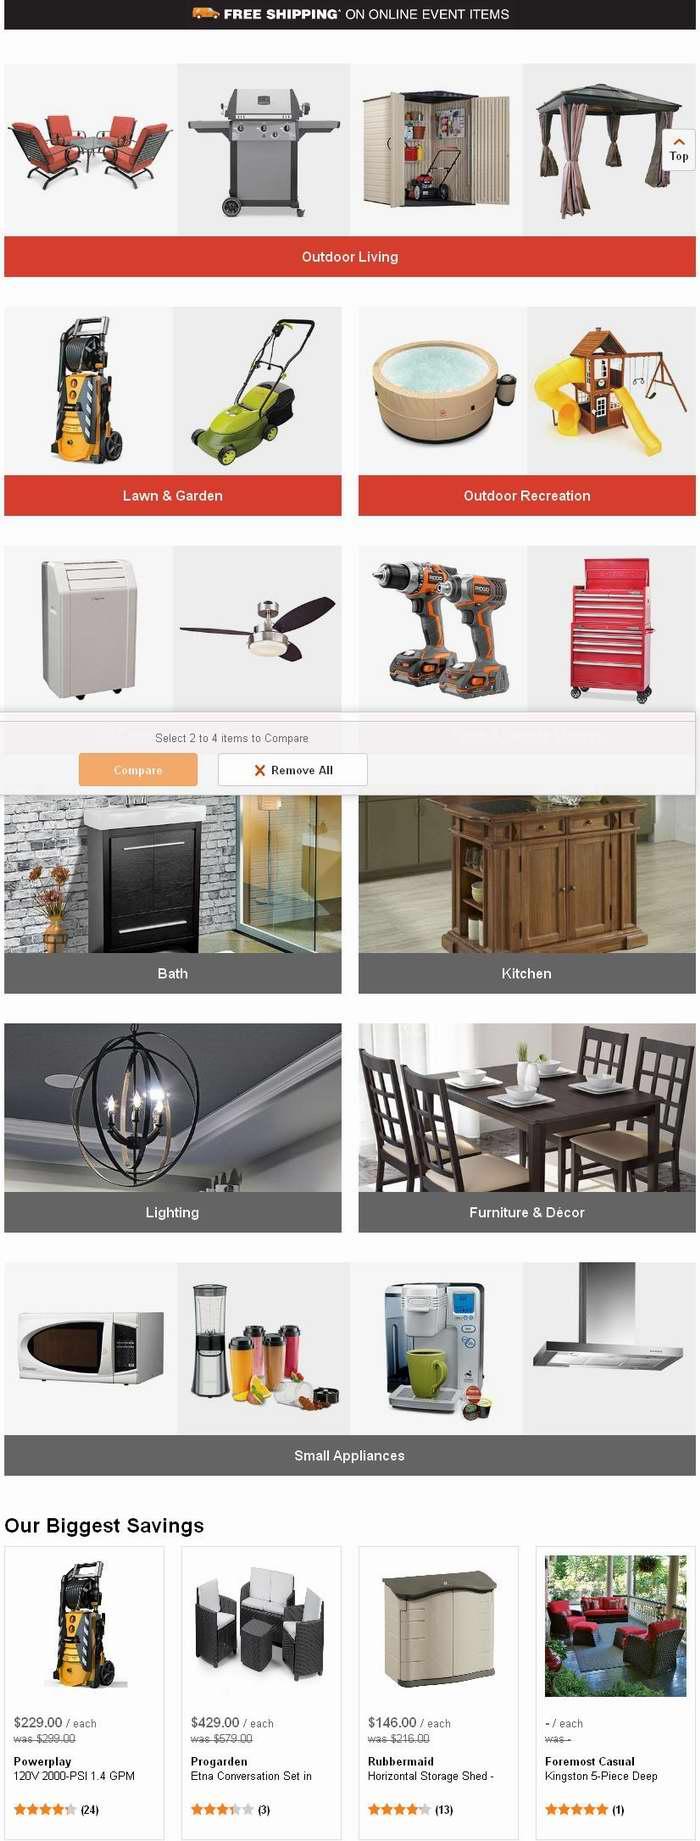 outdoor kitchen bbq kits table for 8 home depot 国庆特卖 精选大量户外家具 bbq烧烤炉 工具棚 凉棚 割草 工具